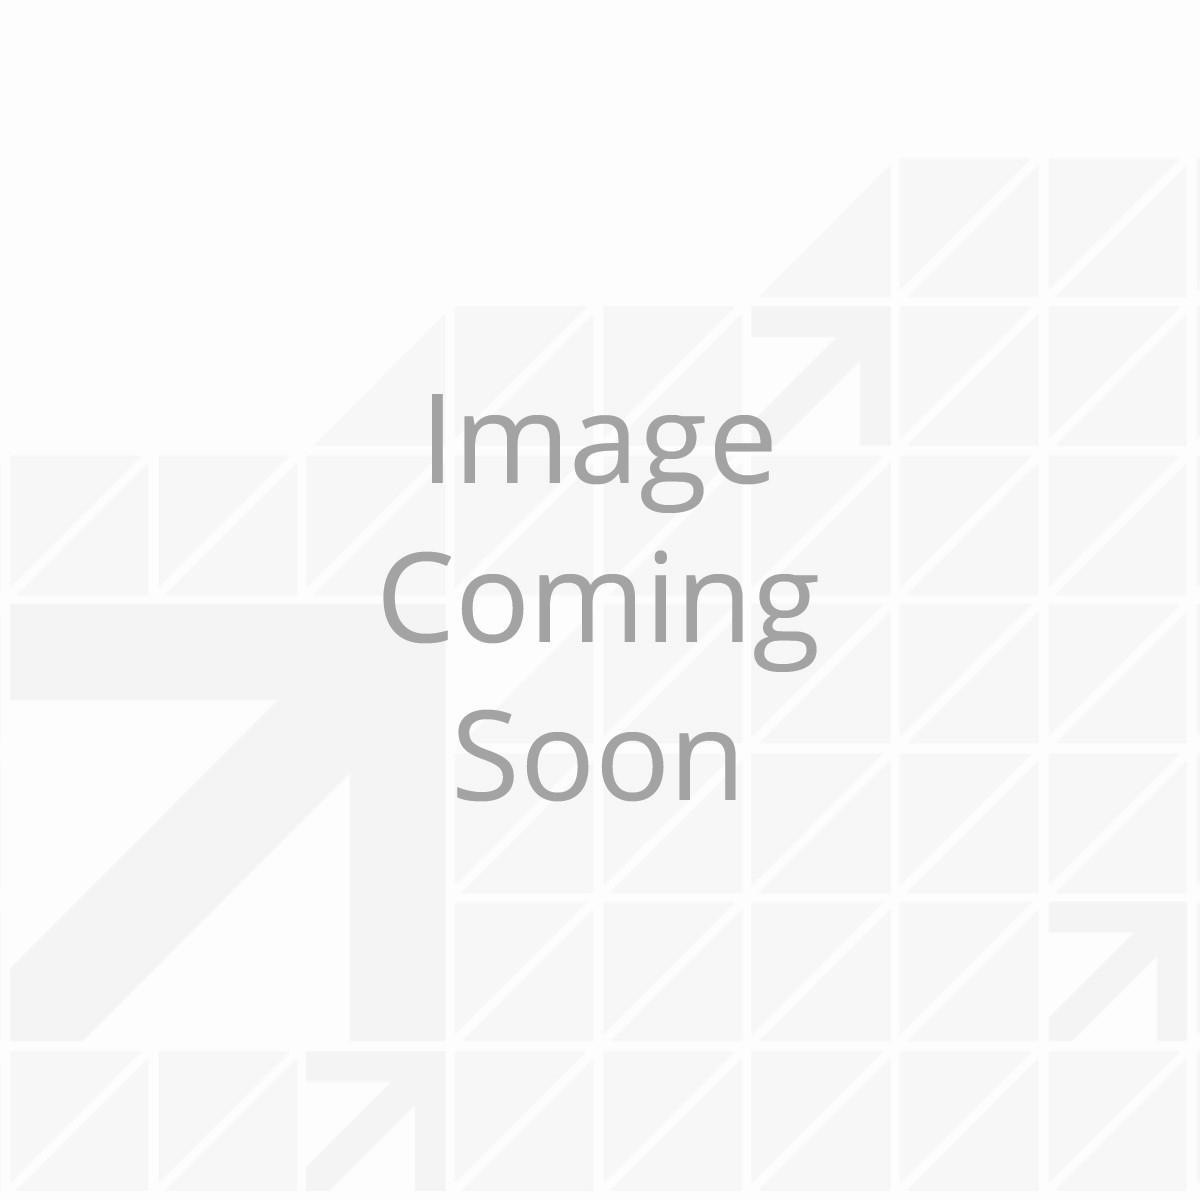 285083_-_torque_shaft_-_001